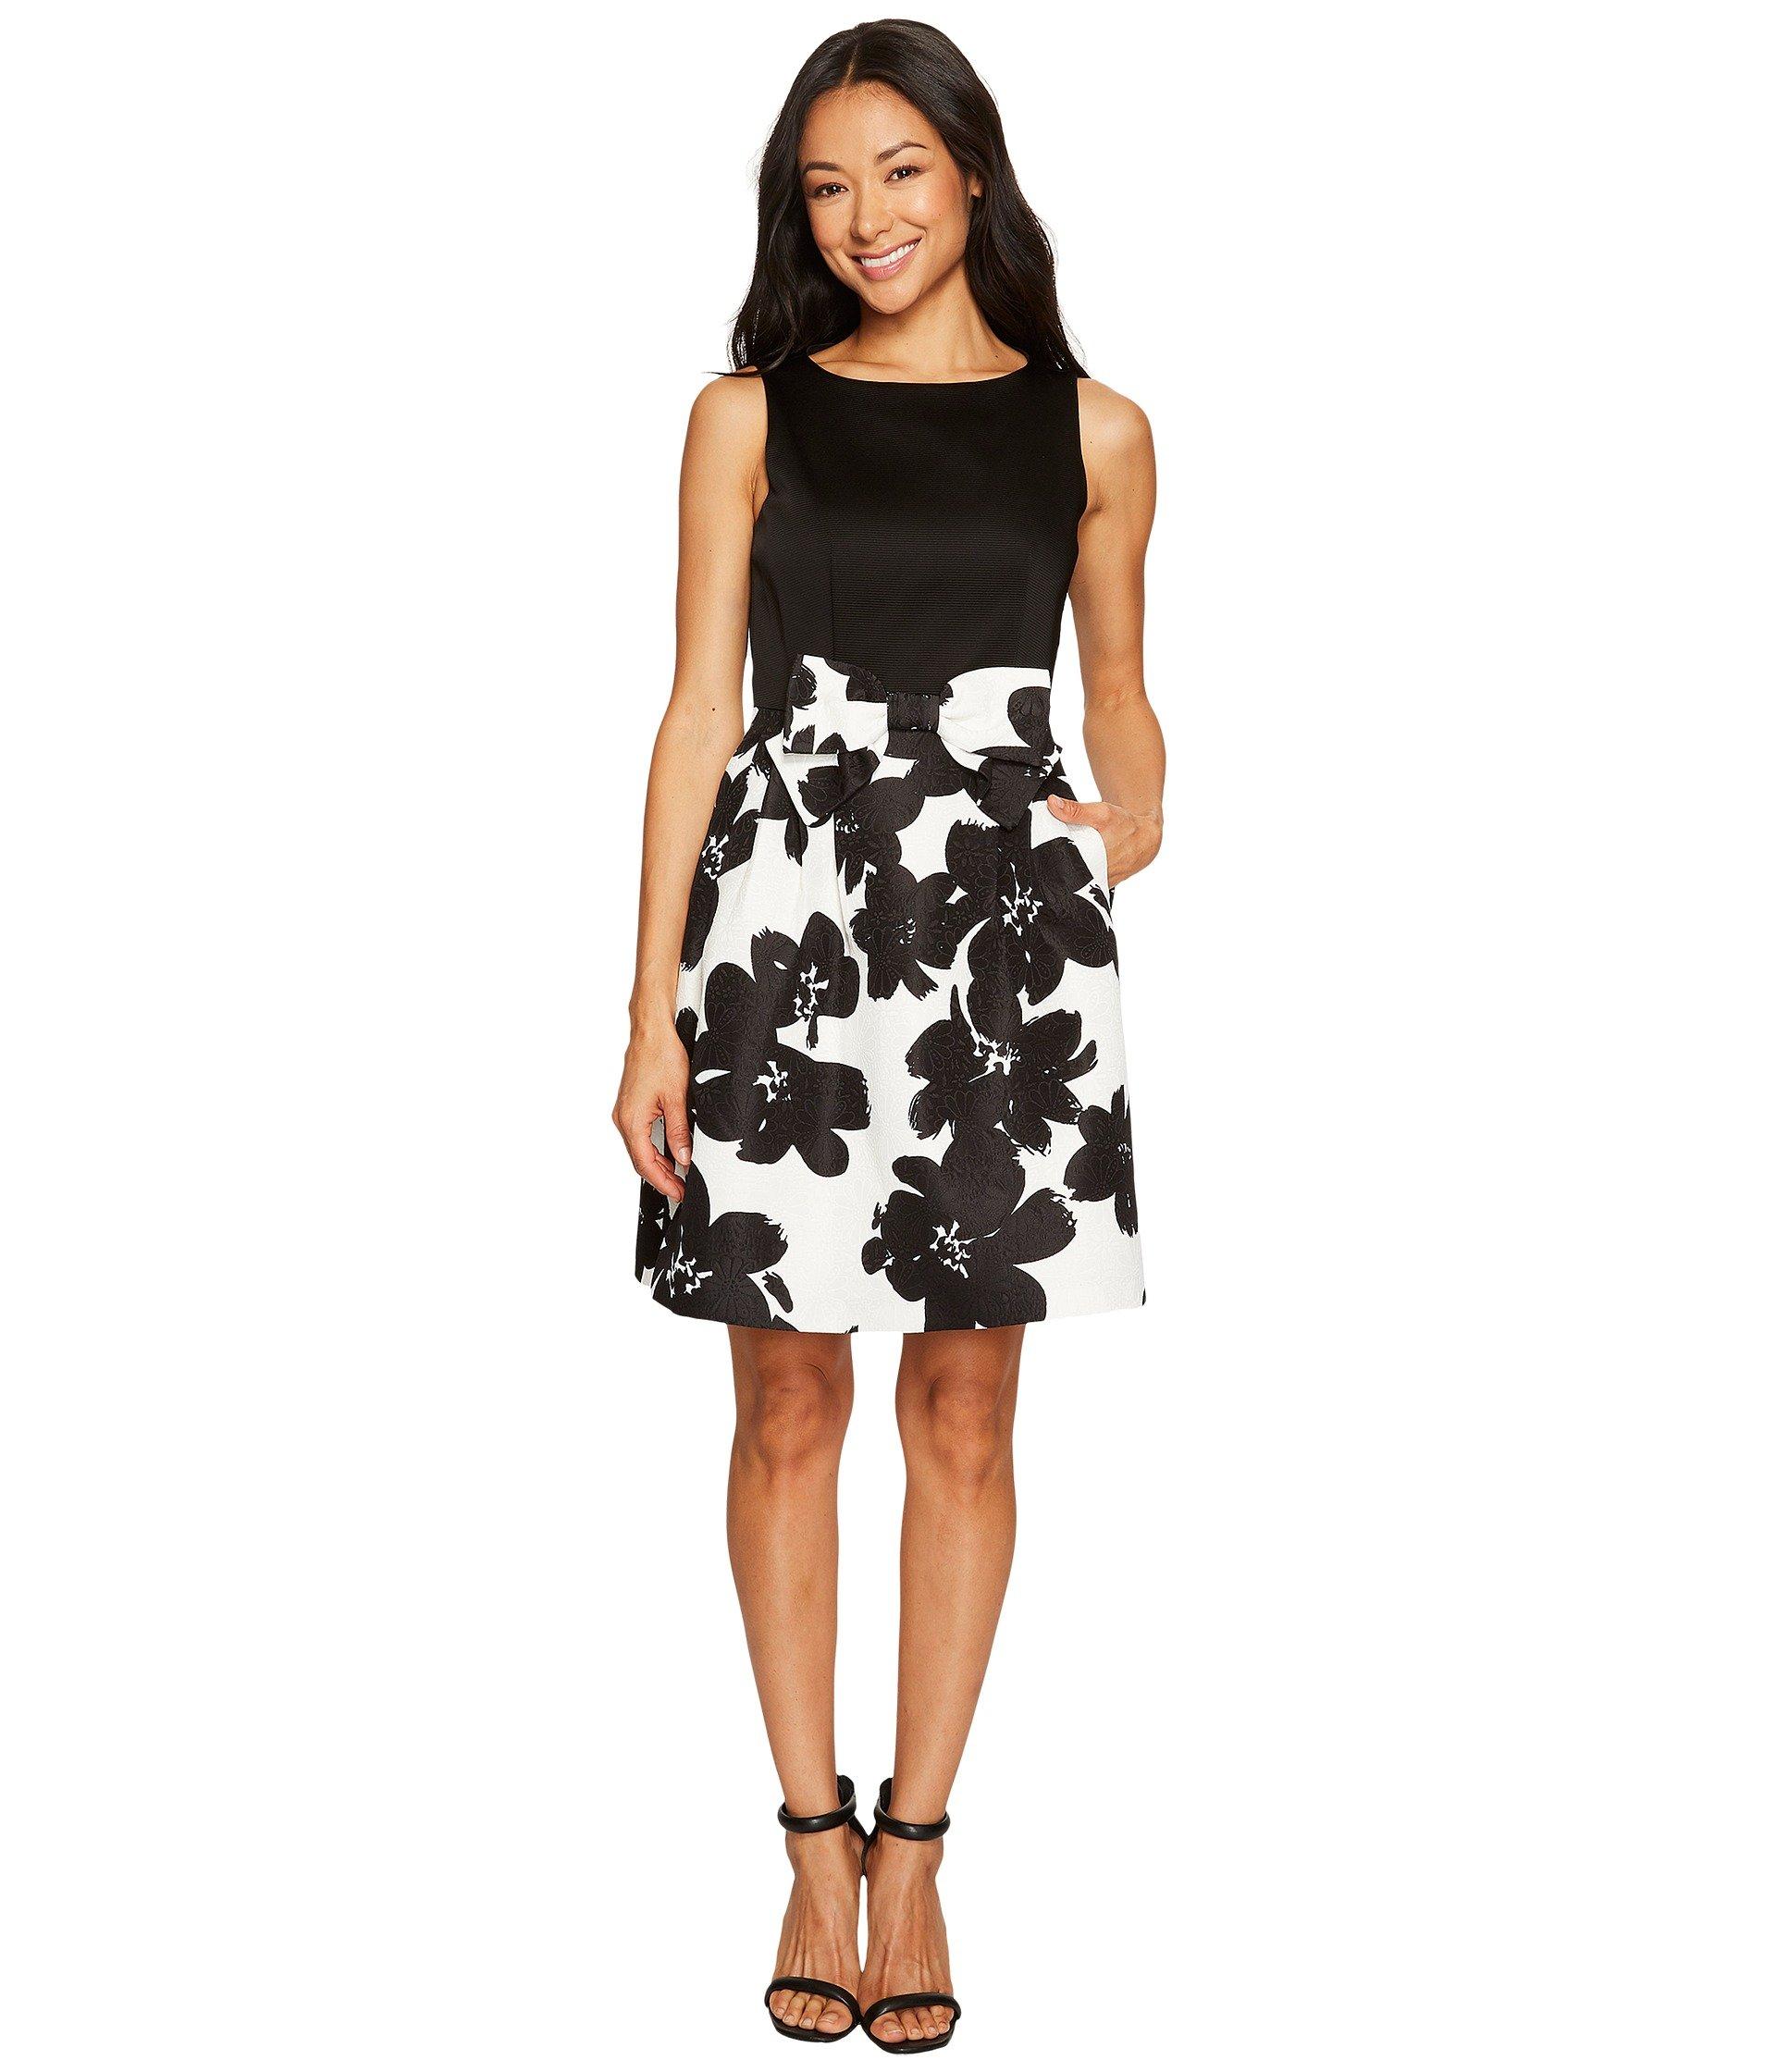 Tahari By Asl Petite Jacquard Skirt Fit And Flare Dress At 6pm